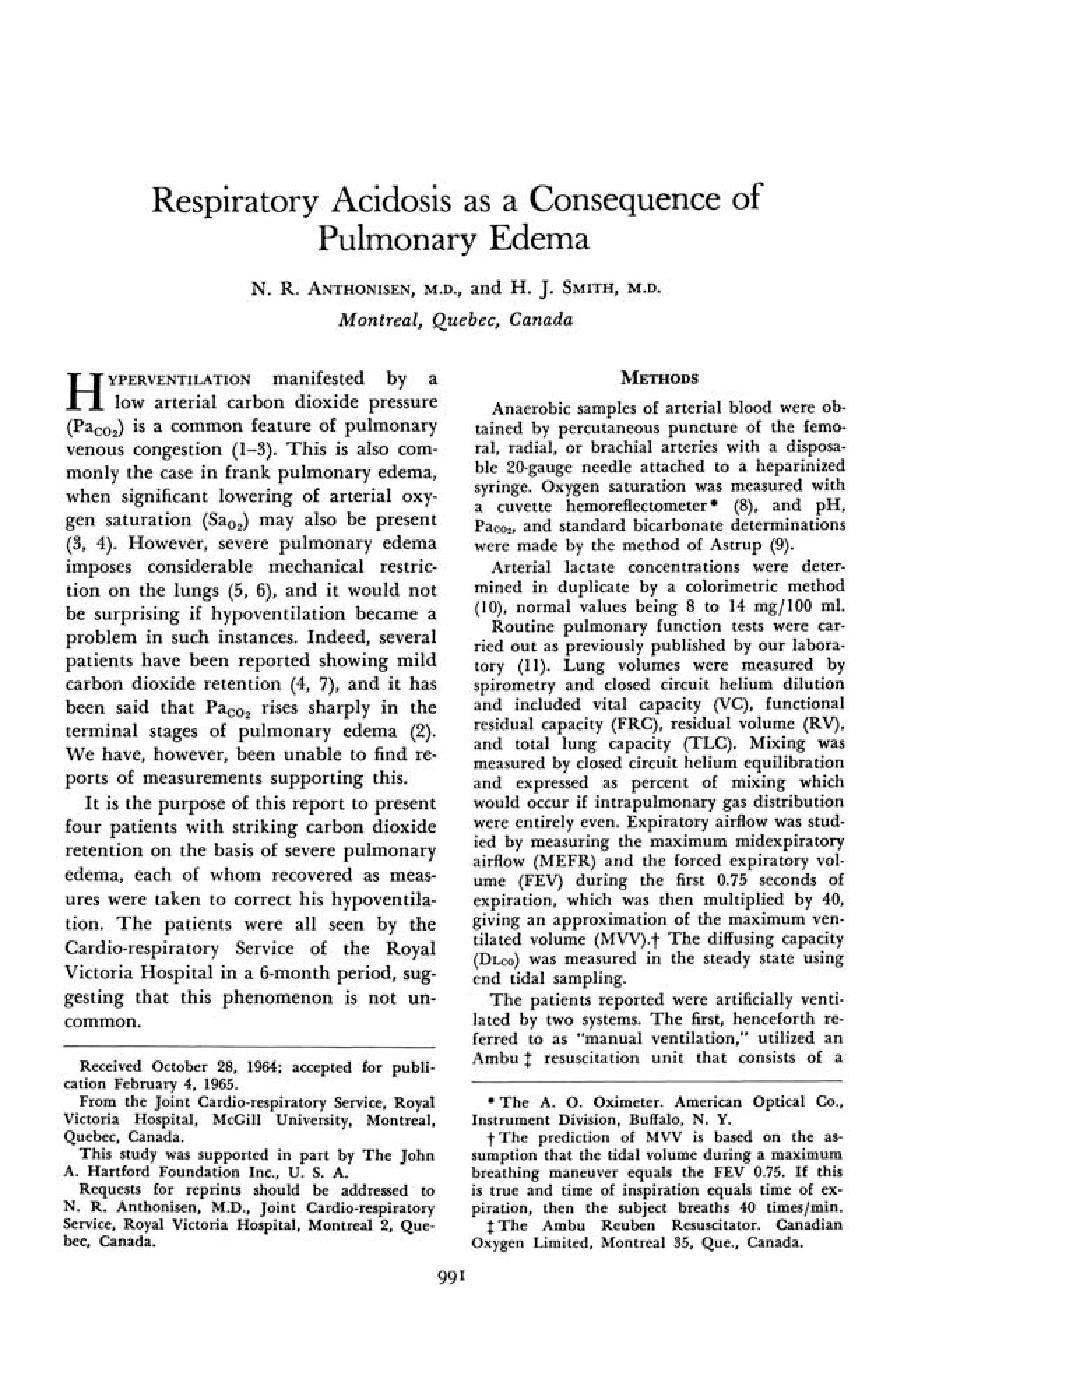 Respiratory Acidosis As A Consequence Of Pulmonary Edema